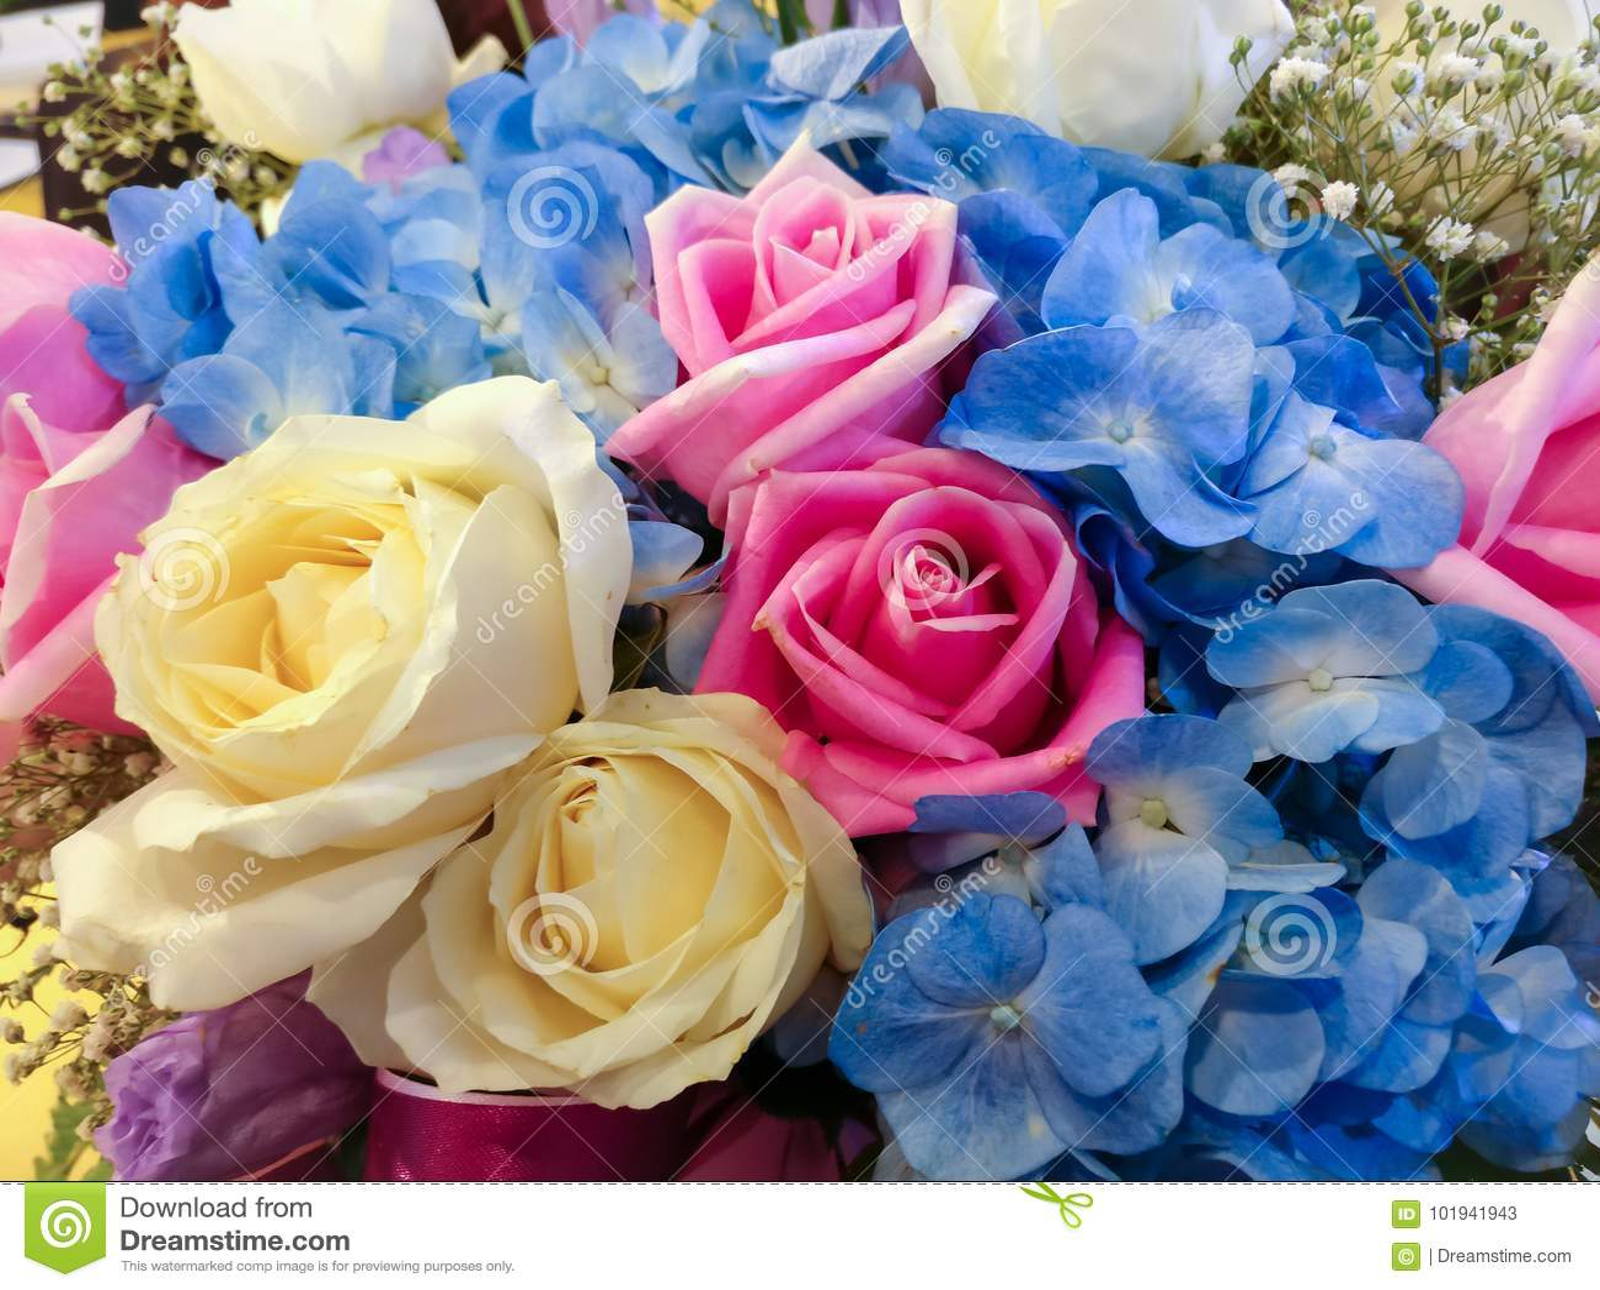 Flower Bouquet Stock Image Image Of Fresh Floral Closeup 101941943